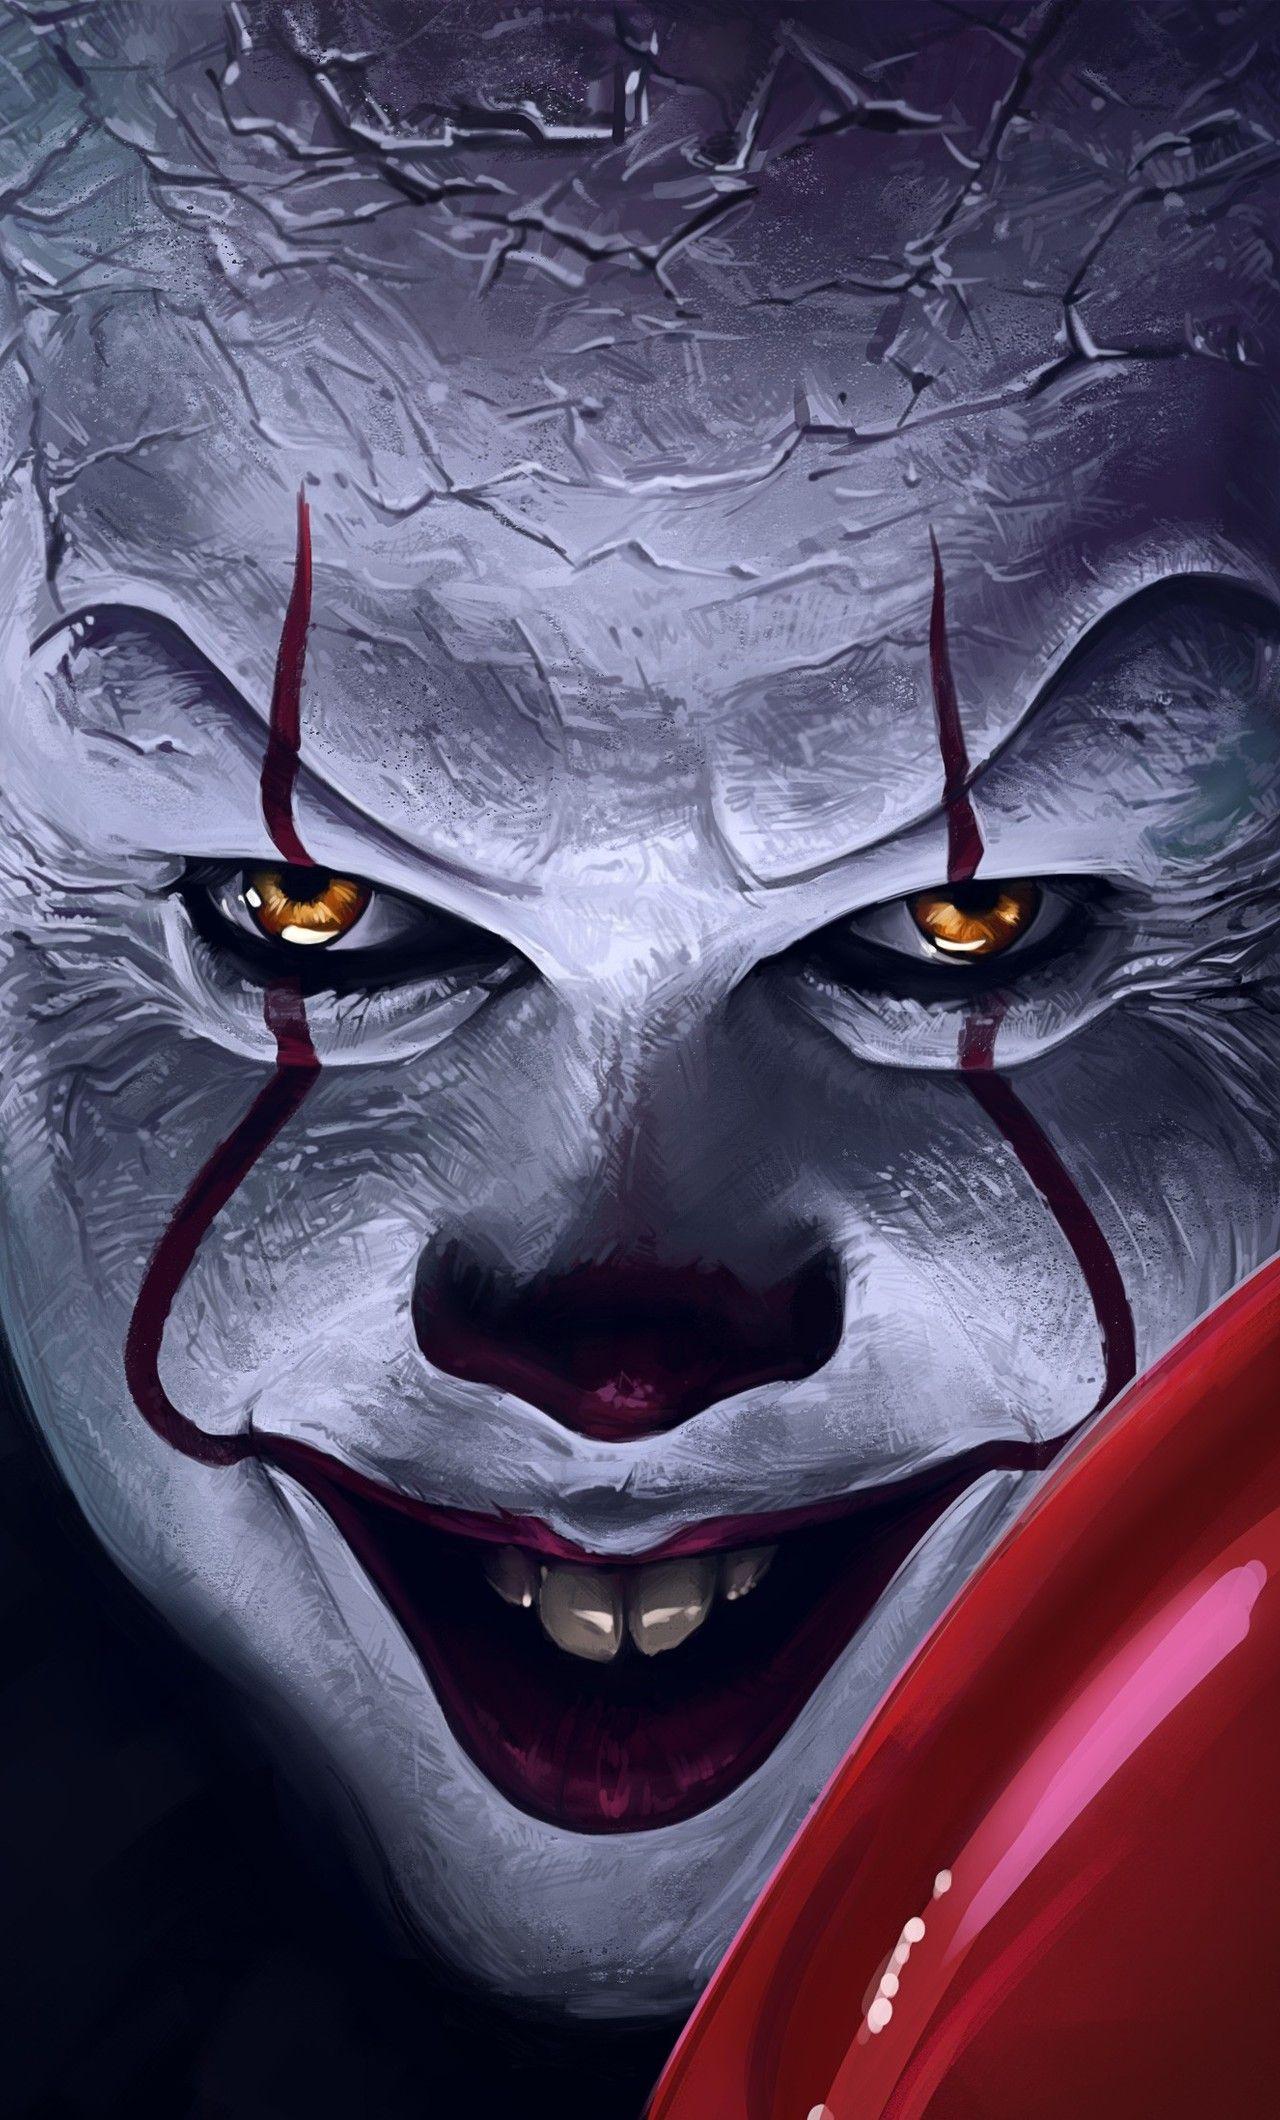 Pin By Teri Lorrence On Danse Macabre Horror Wallpapers Hd Horror Movie Art Clown Horror